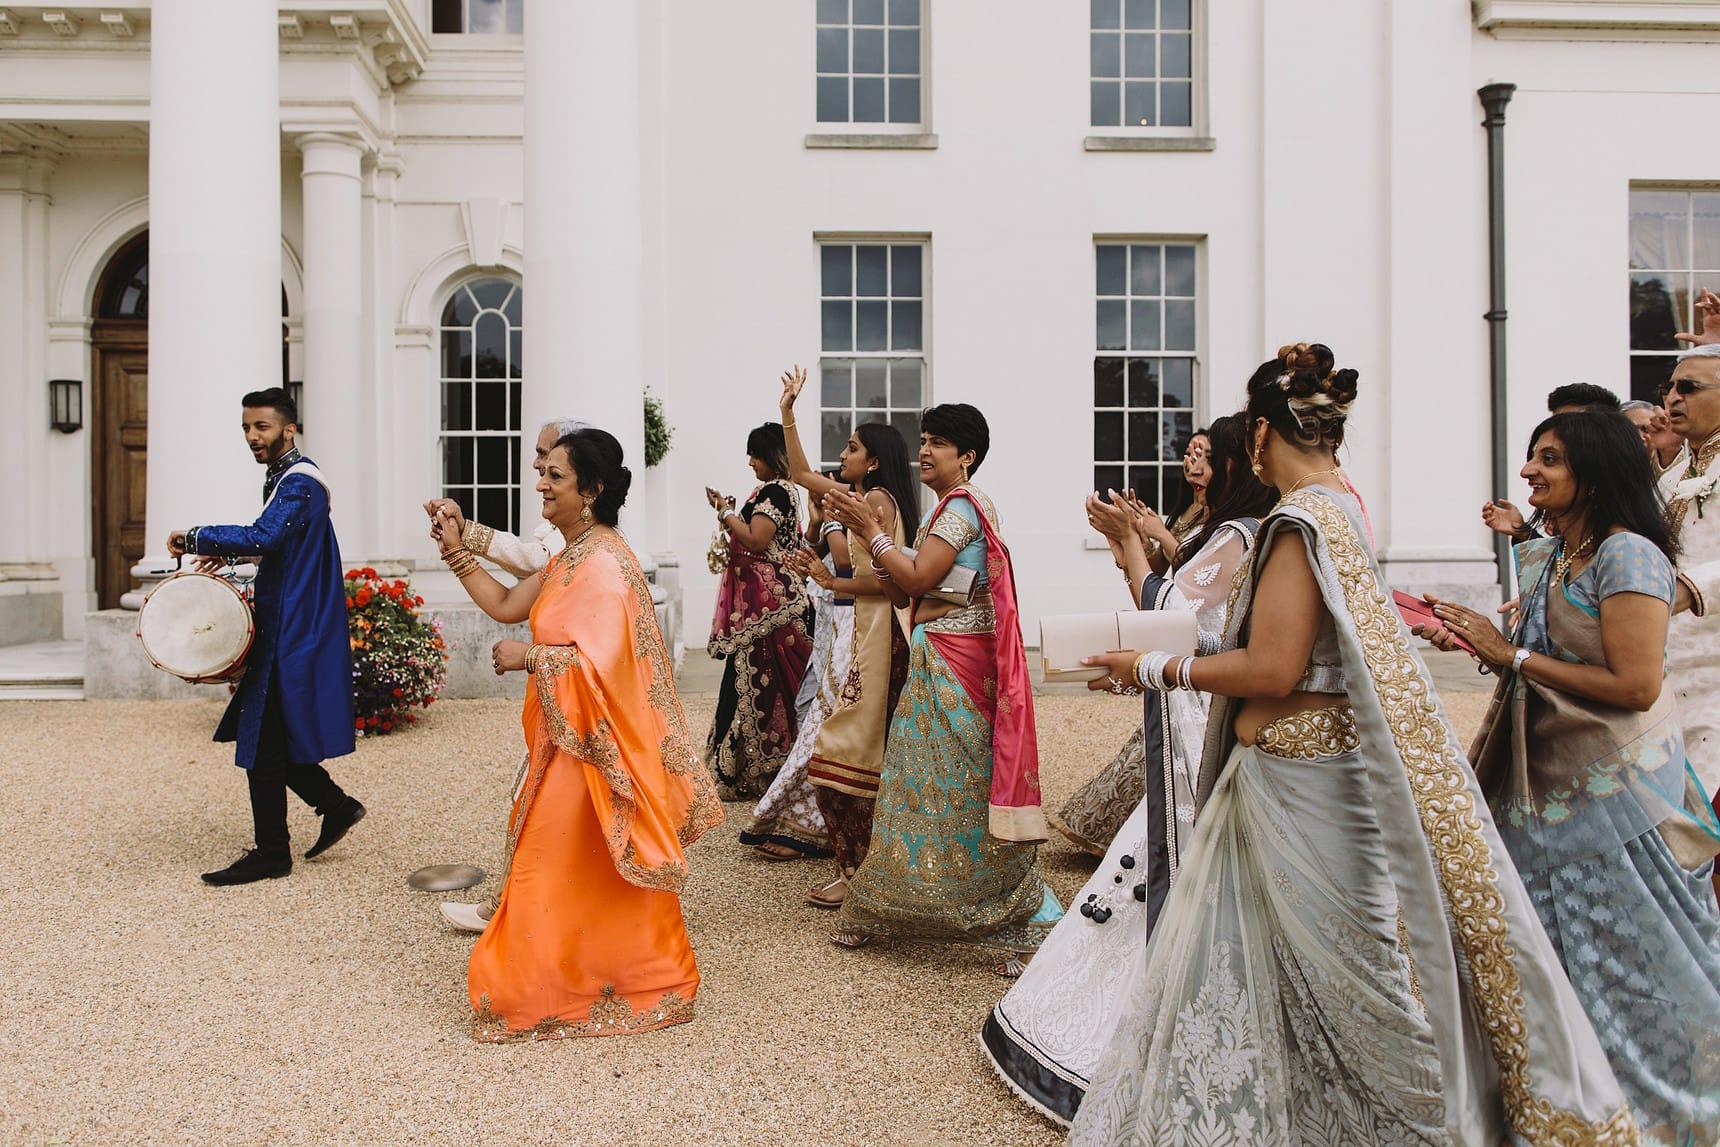 hylands house wedding photography chelmsford essex